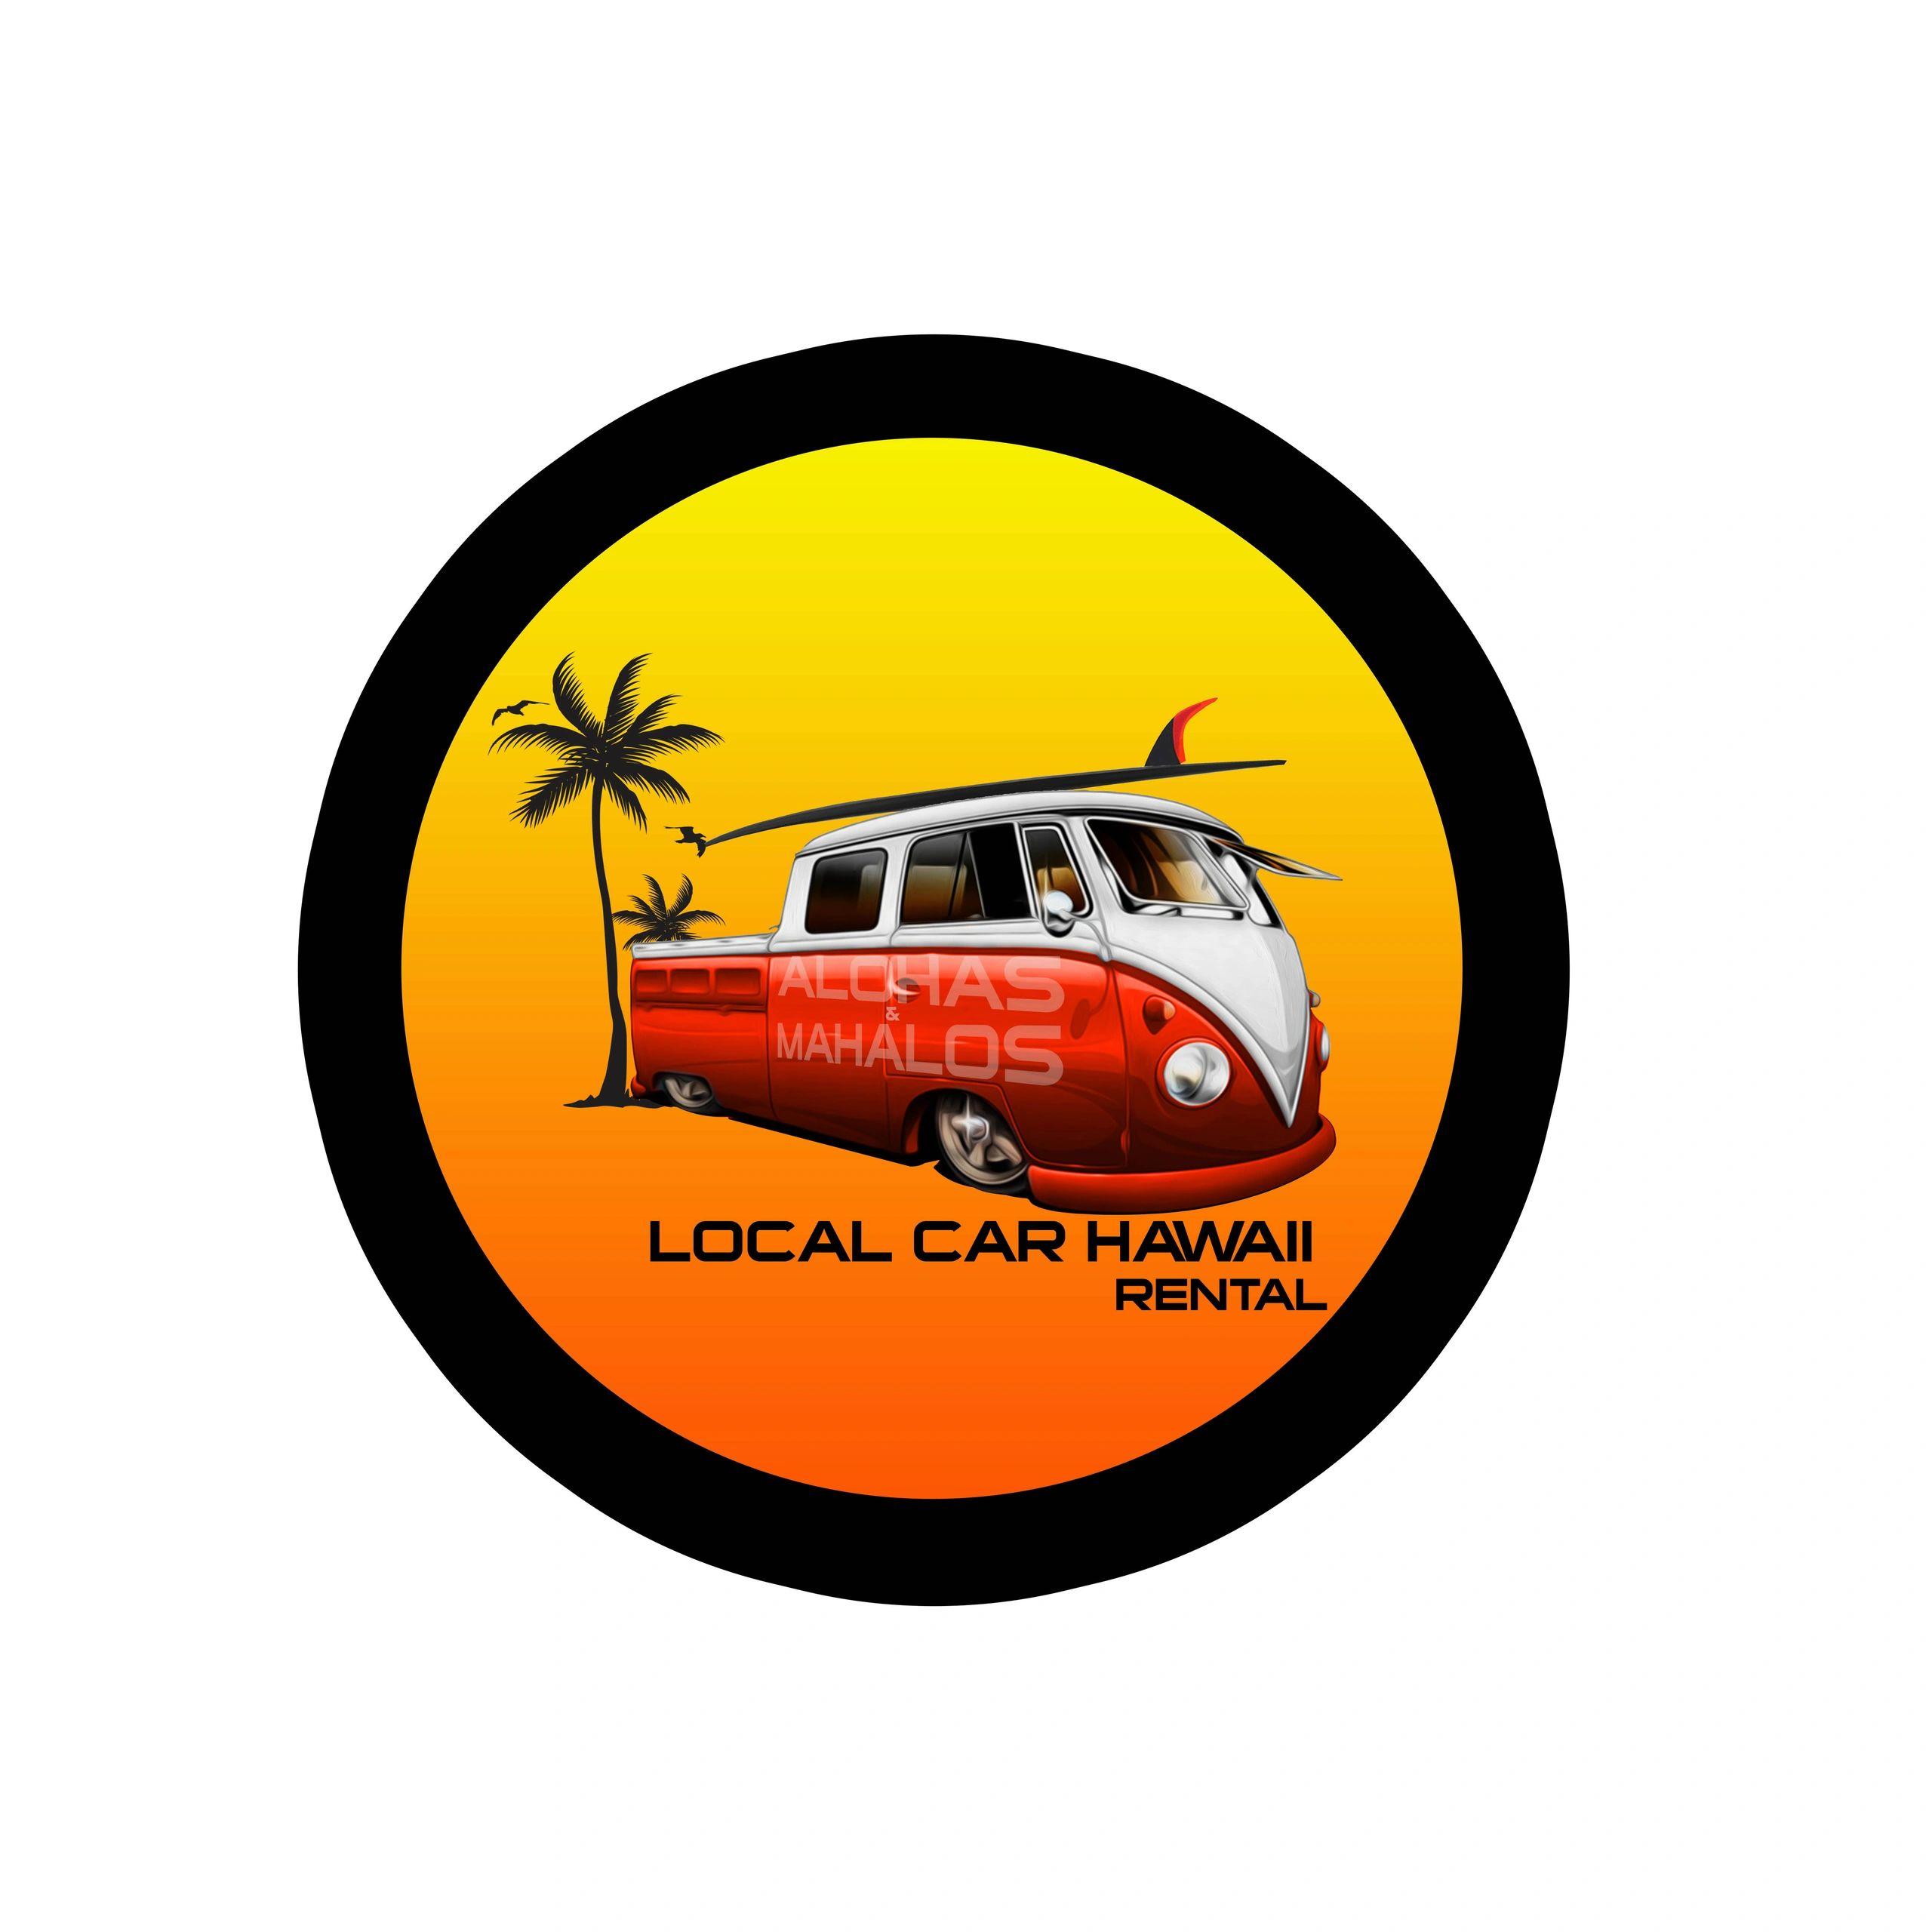 Car Rental In Oahu Hawaii North Shore Honolulu Wahiawa Local Car